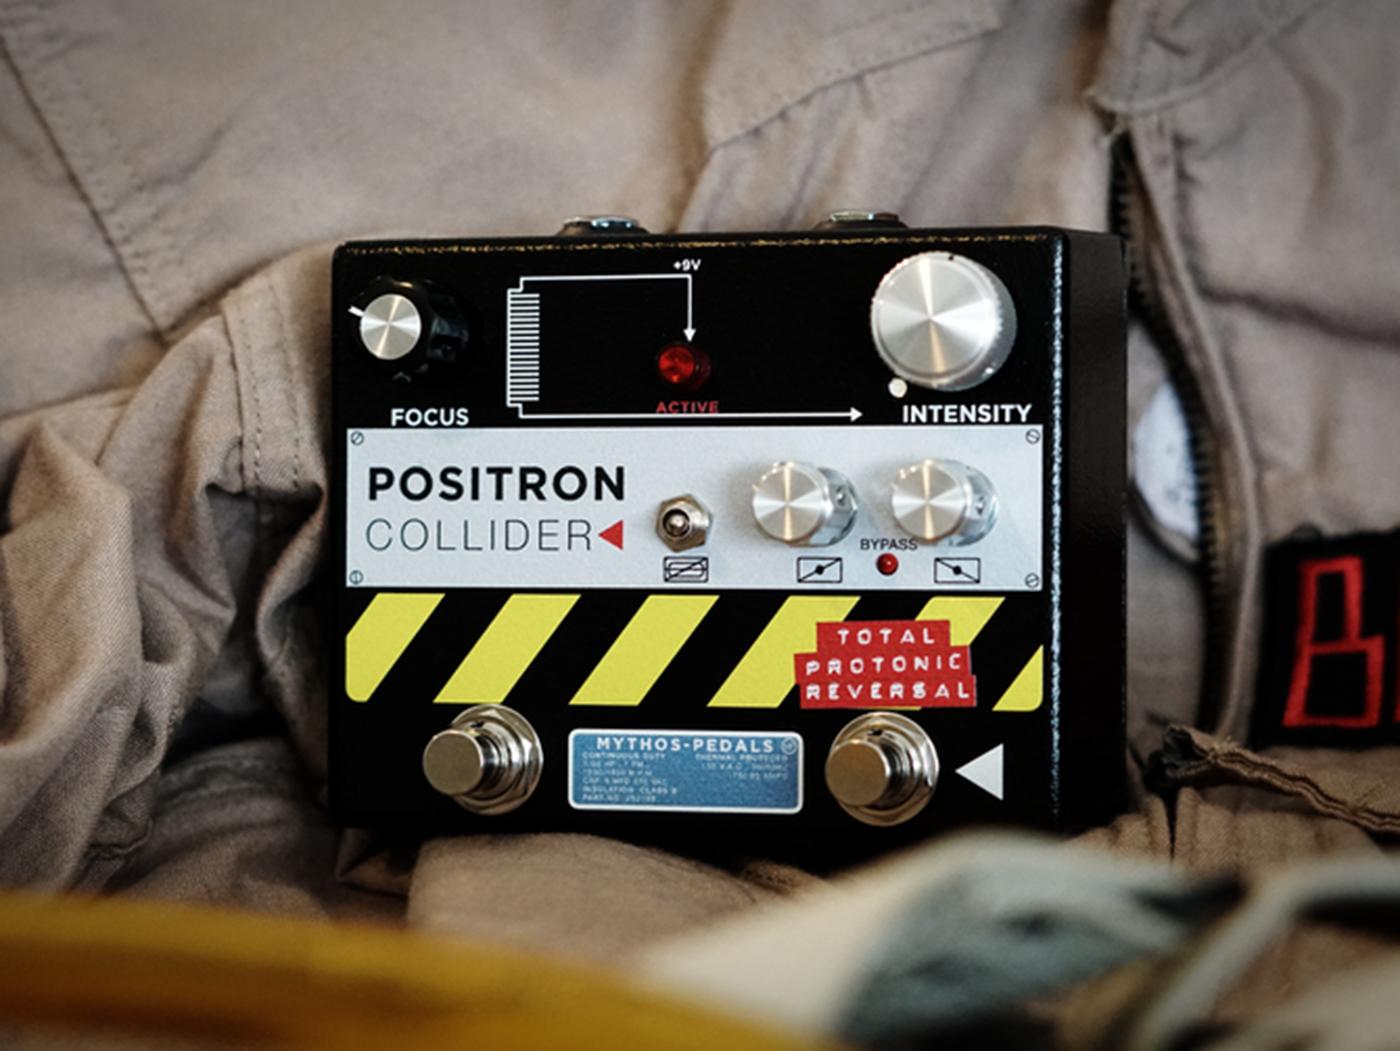 Mythos Pedals Positron Collider Fuzz Pedal